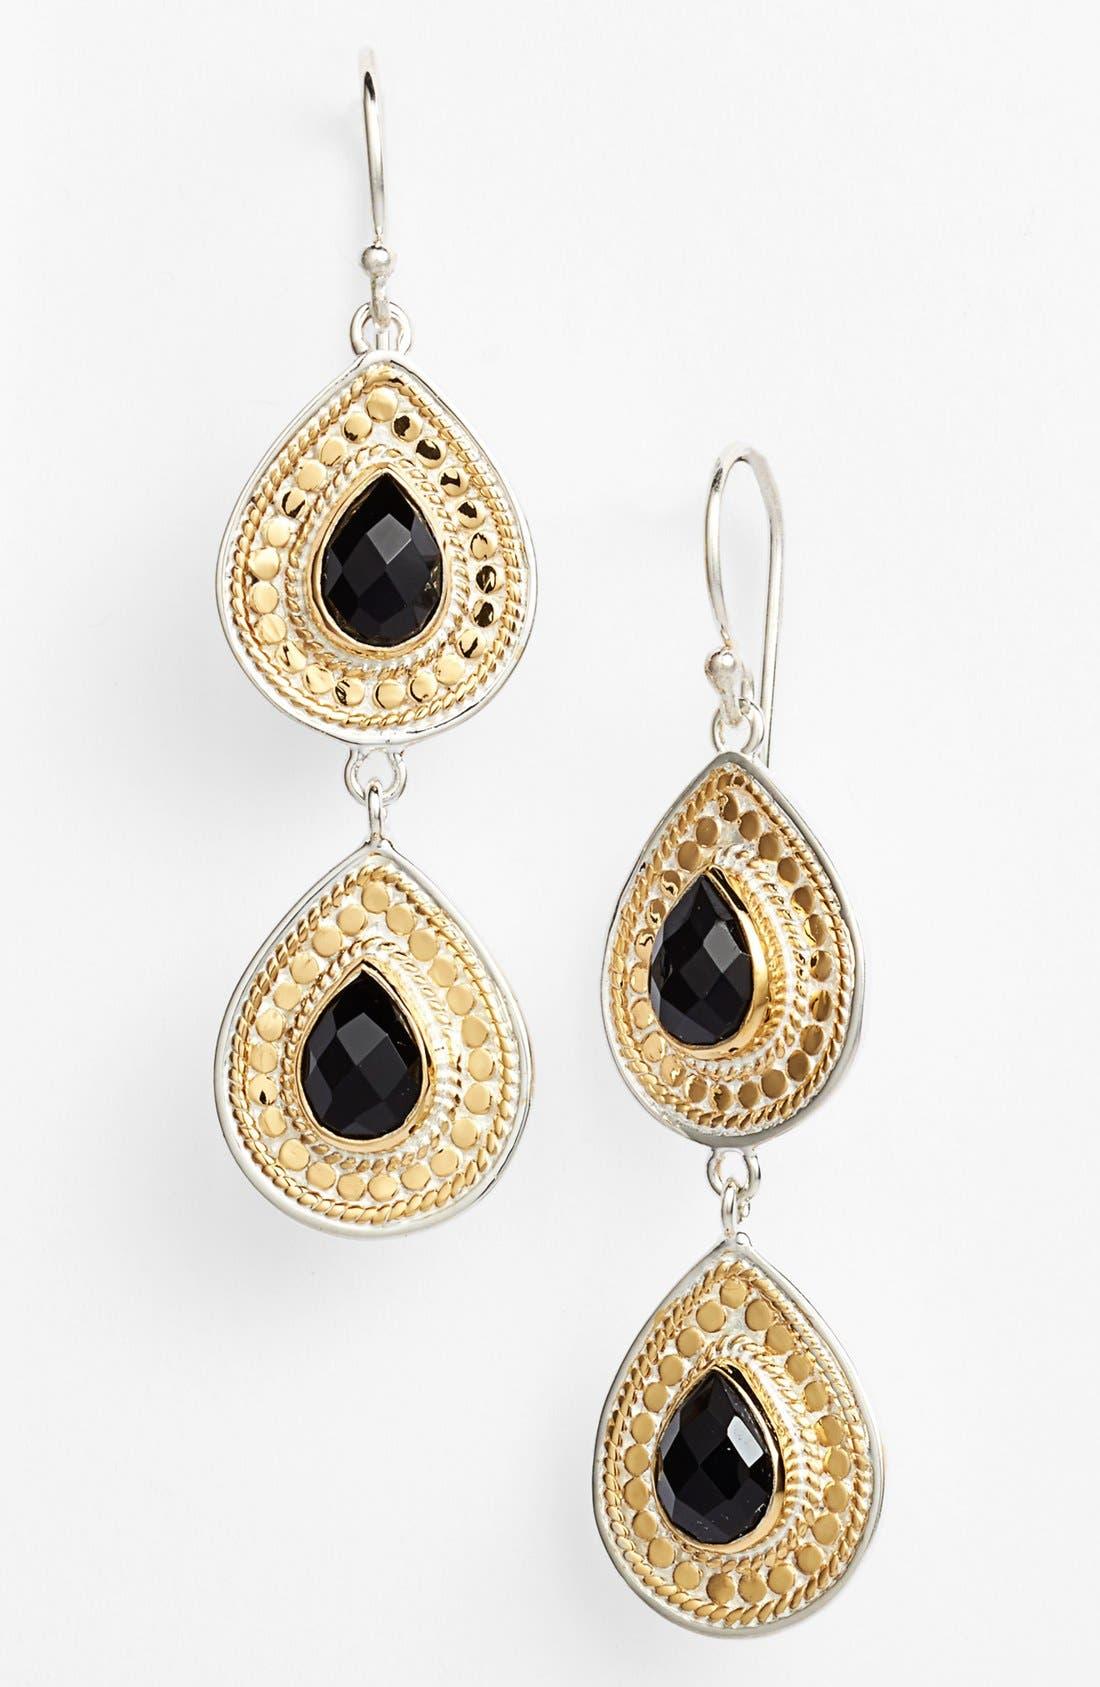 Main Image - Anna Beck 'Gili' Double Teardrop Earrings